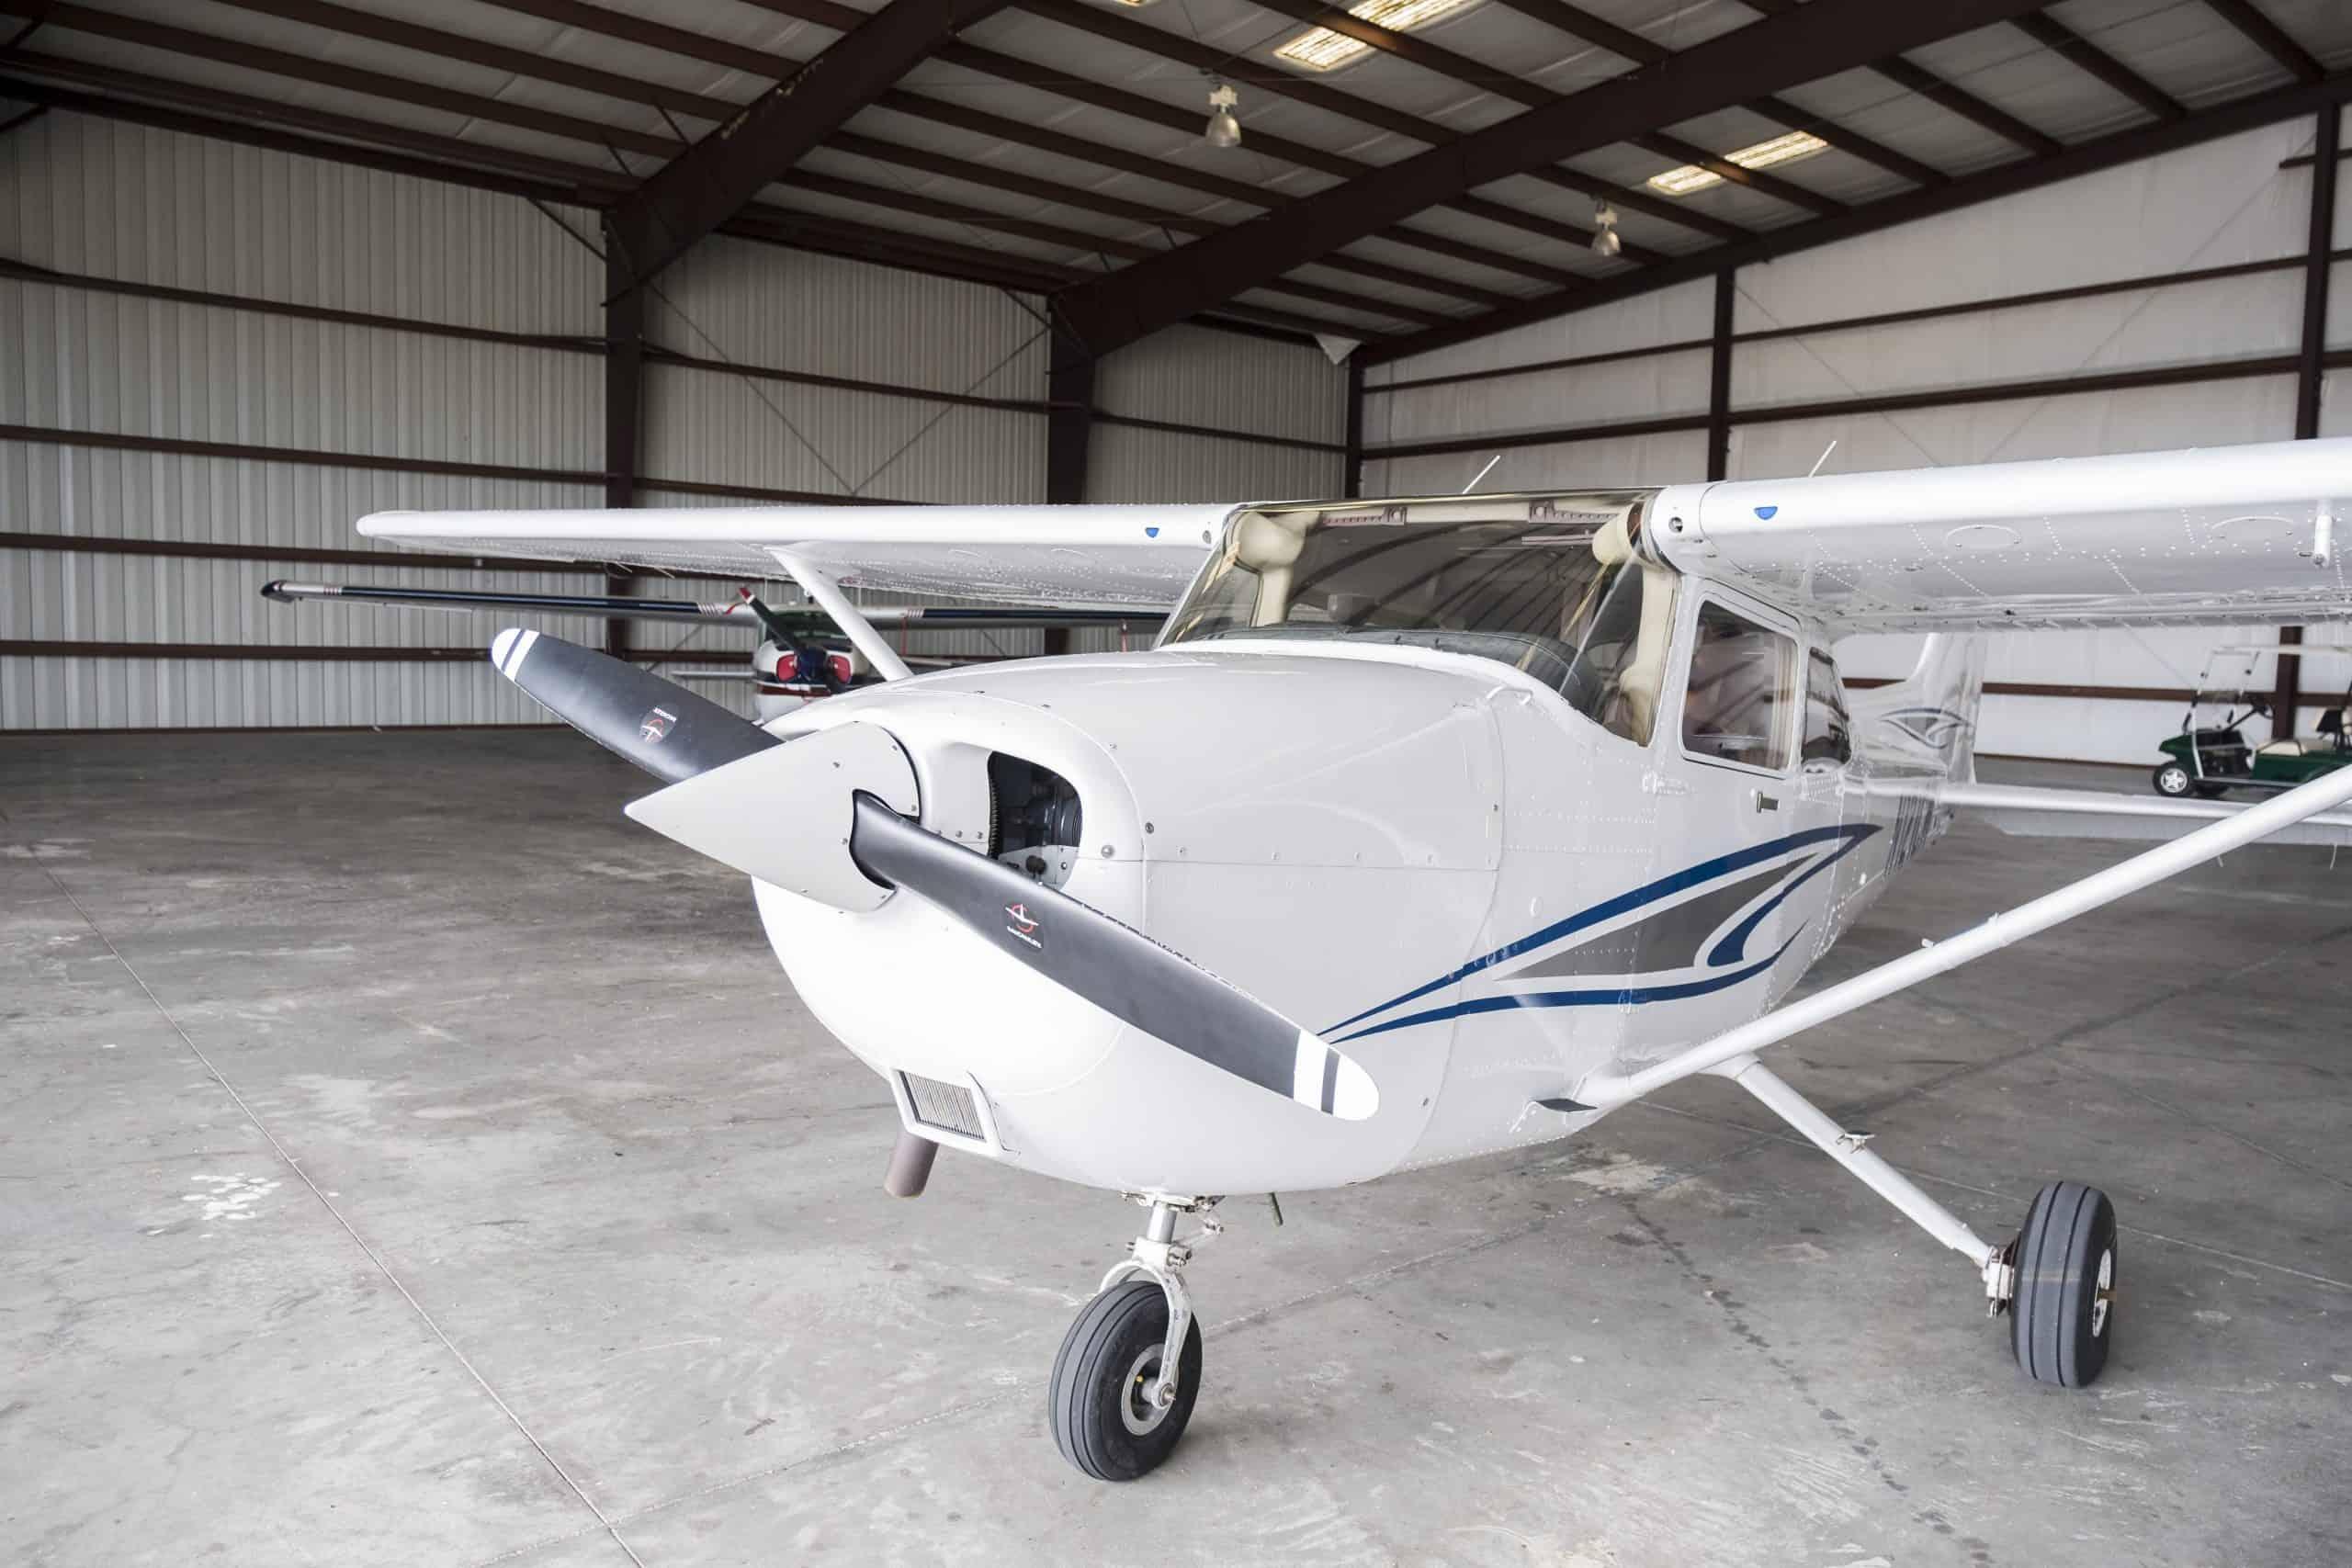 orlando flight training